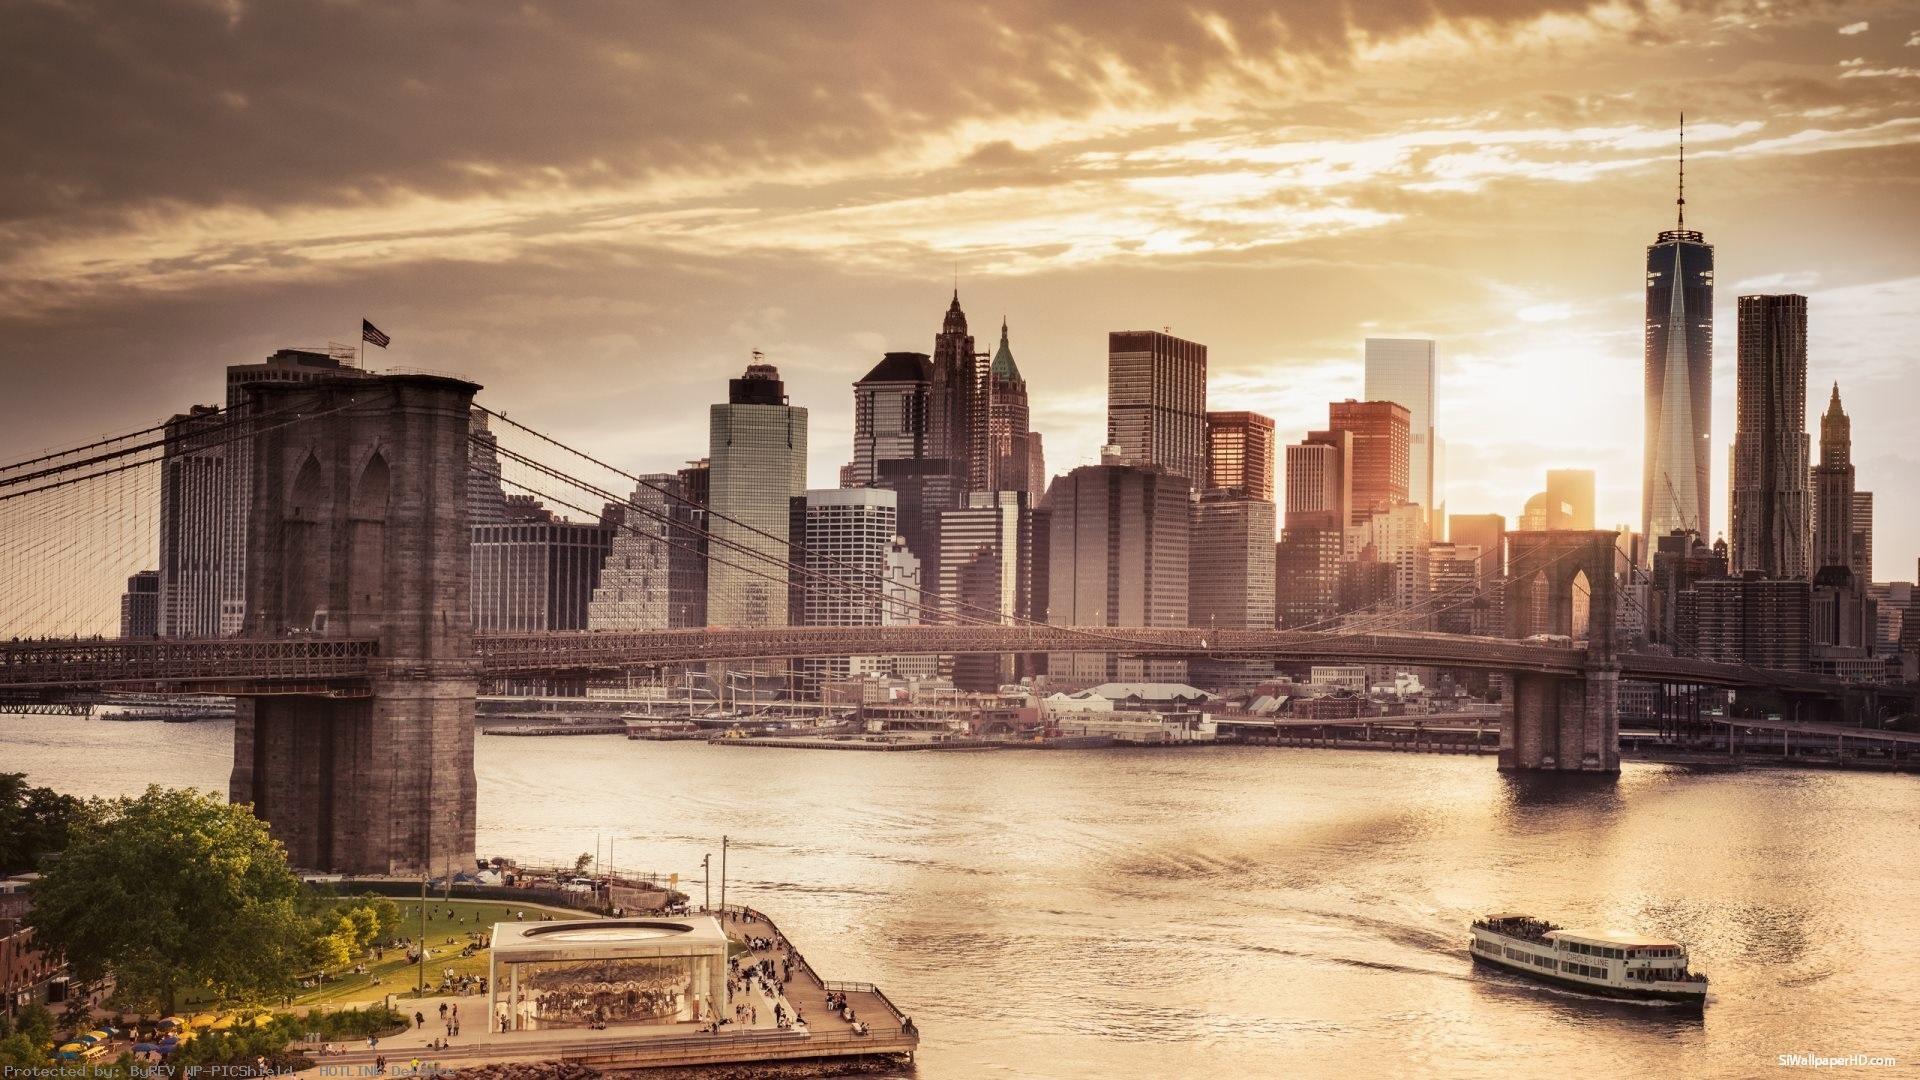 Beautiful-New-York-City-Skyline1920-1080-See-more-